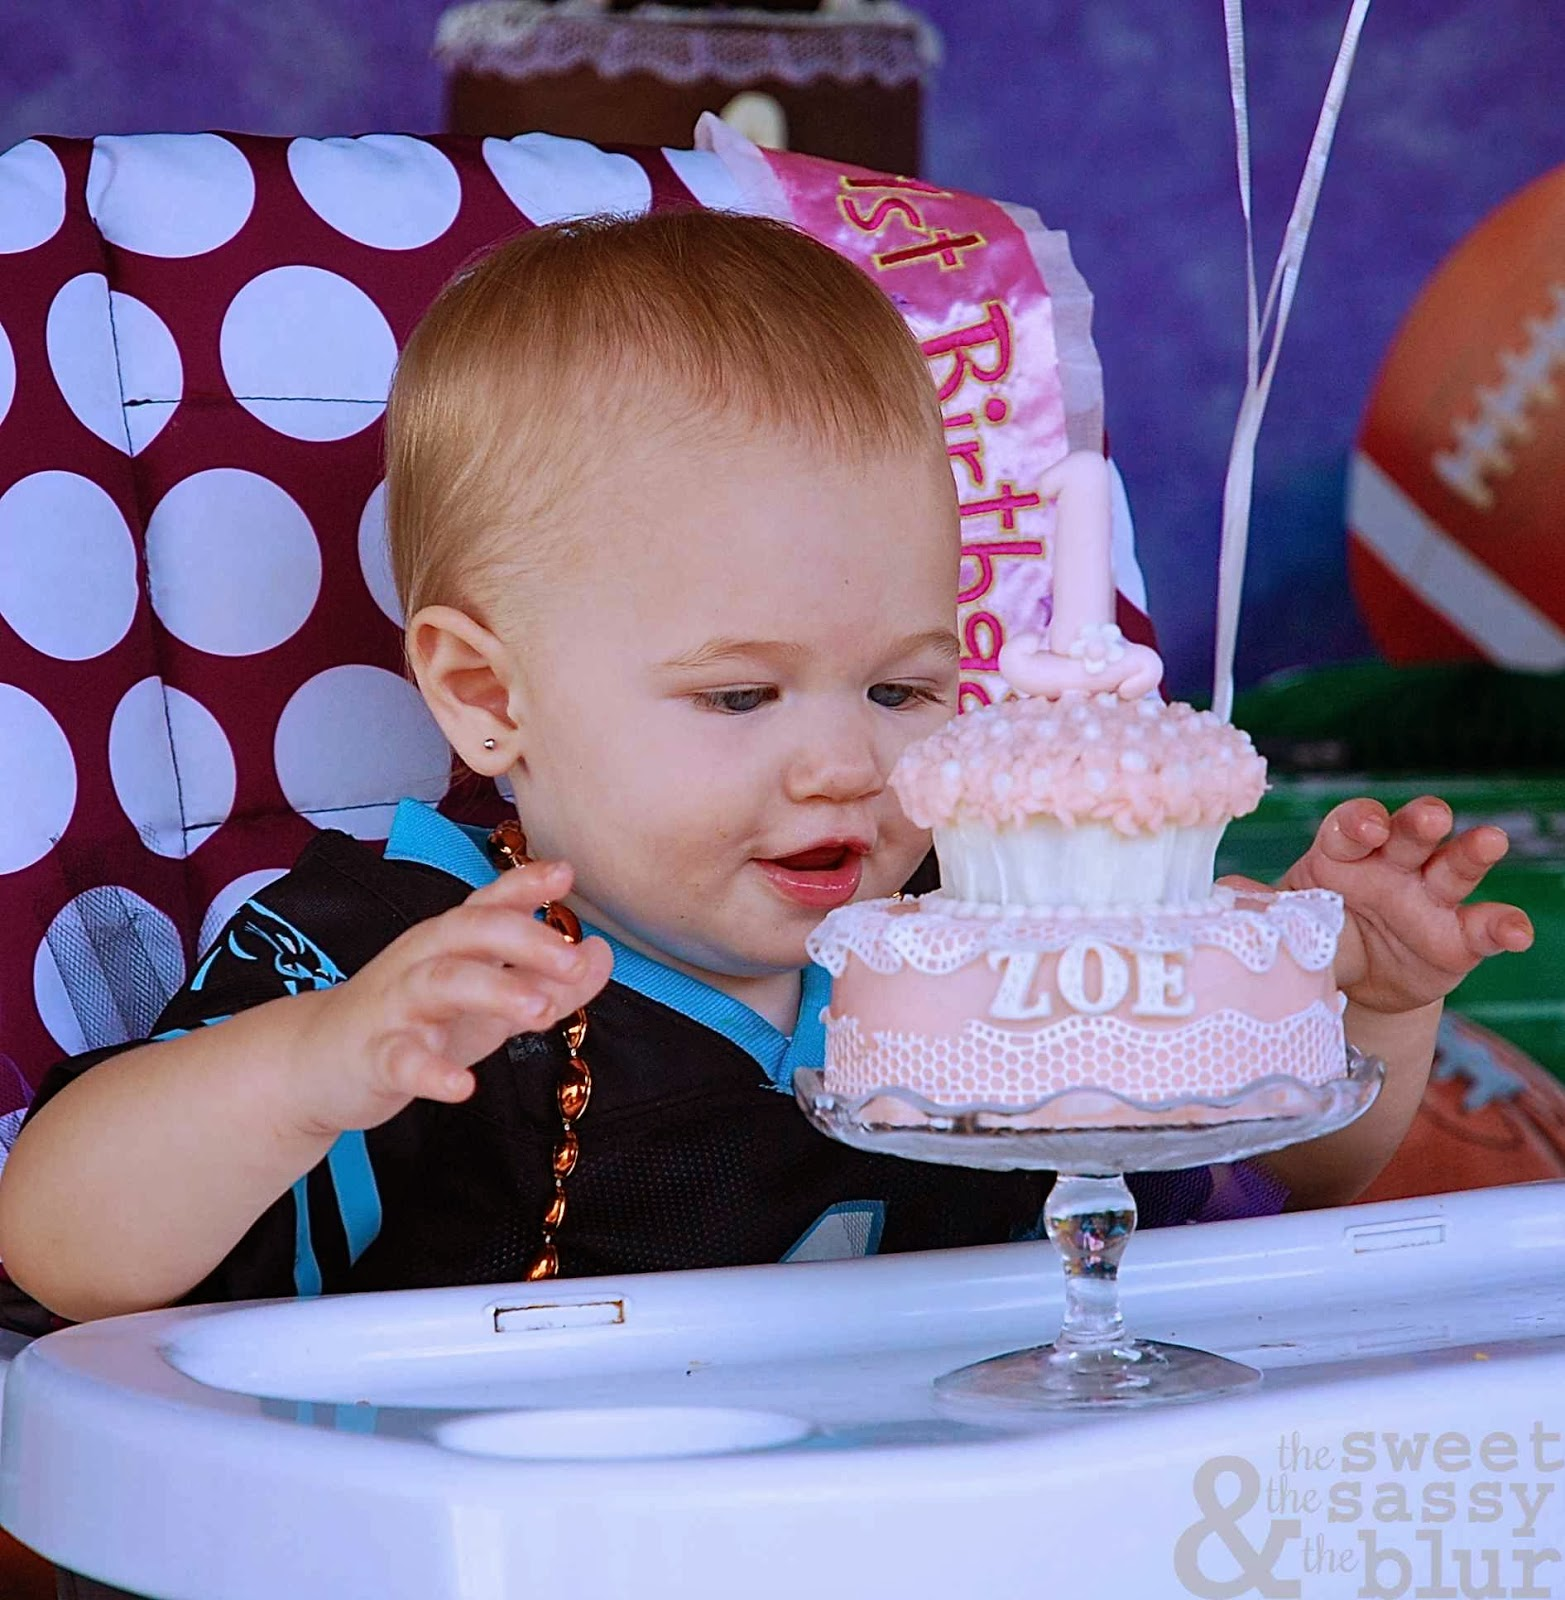 Eating Massive Amounts Of Birthday Cake